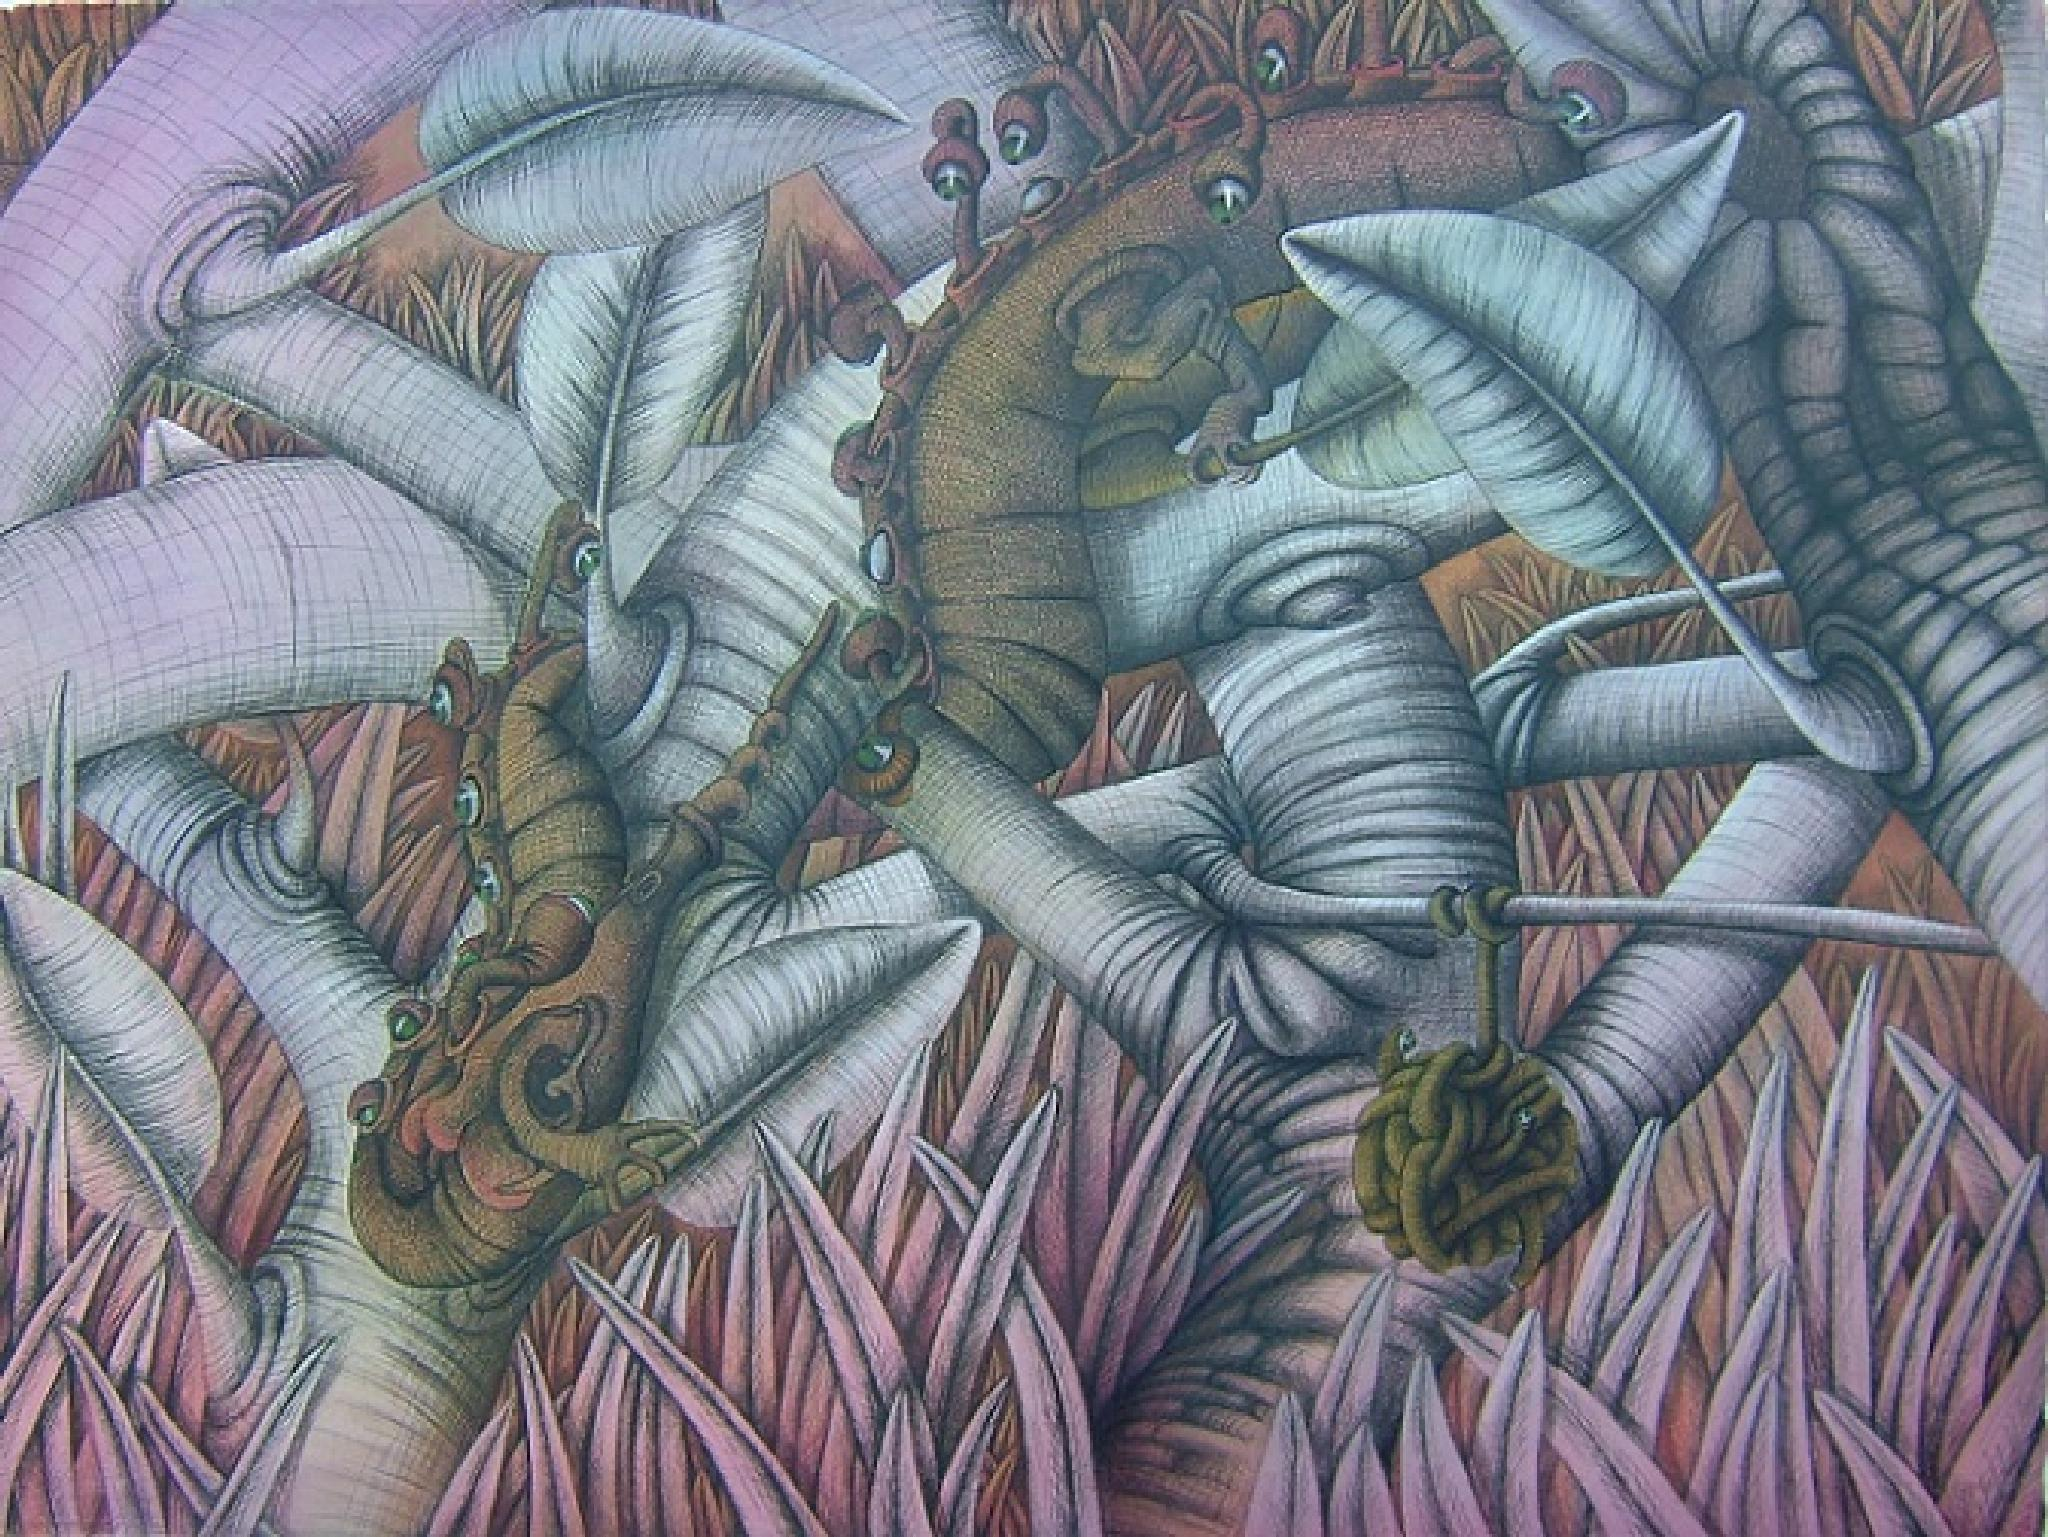 The Jungle watercolor and ink by Al by gerardo.alfonsopiquera